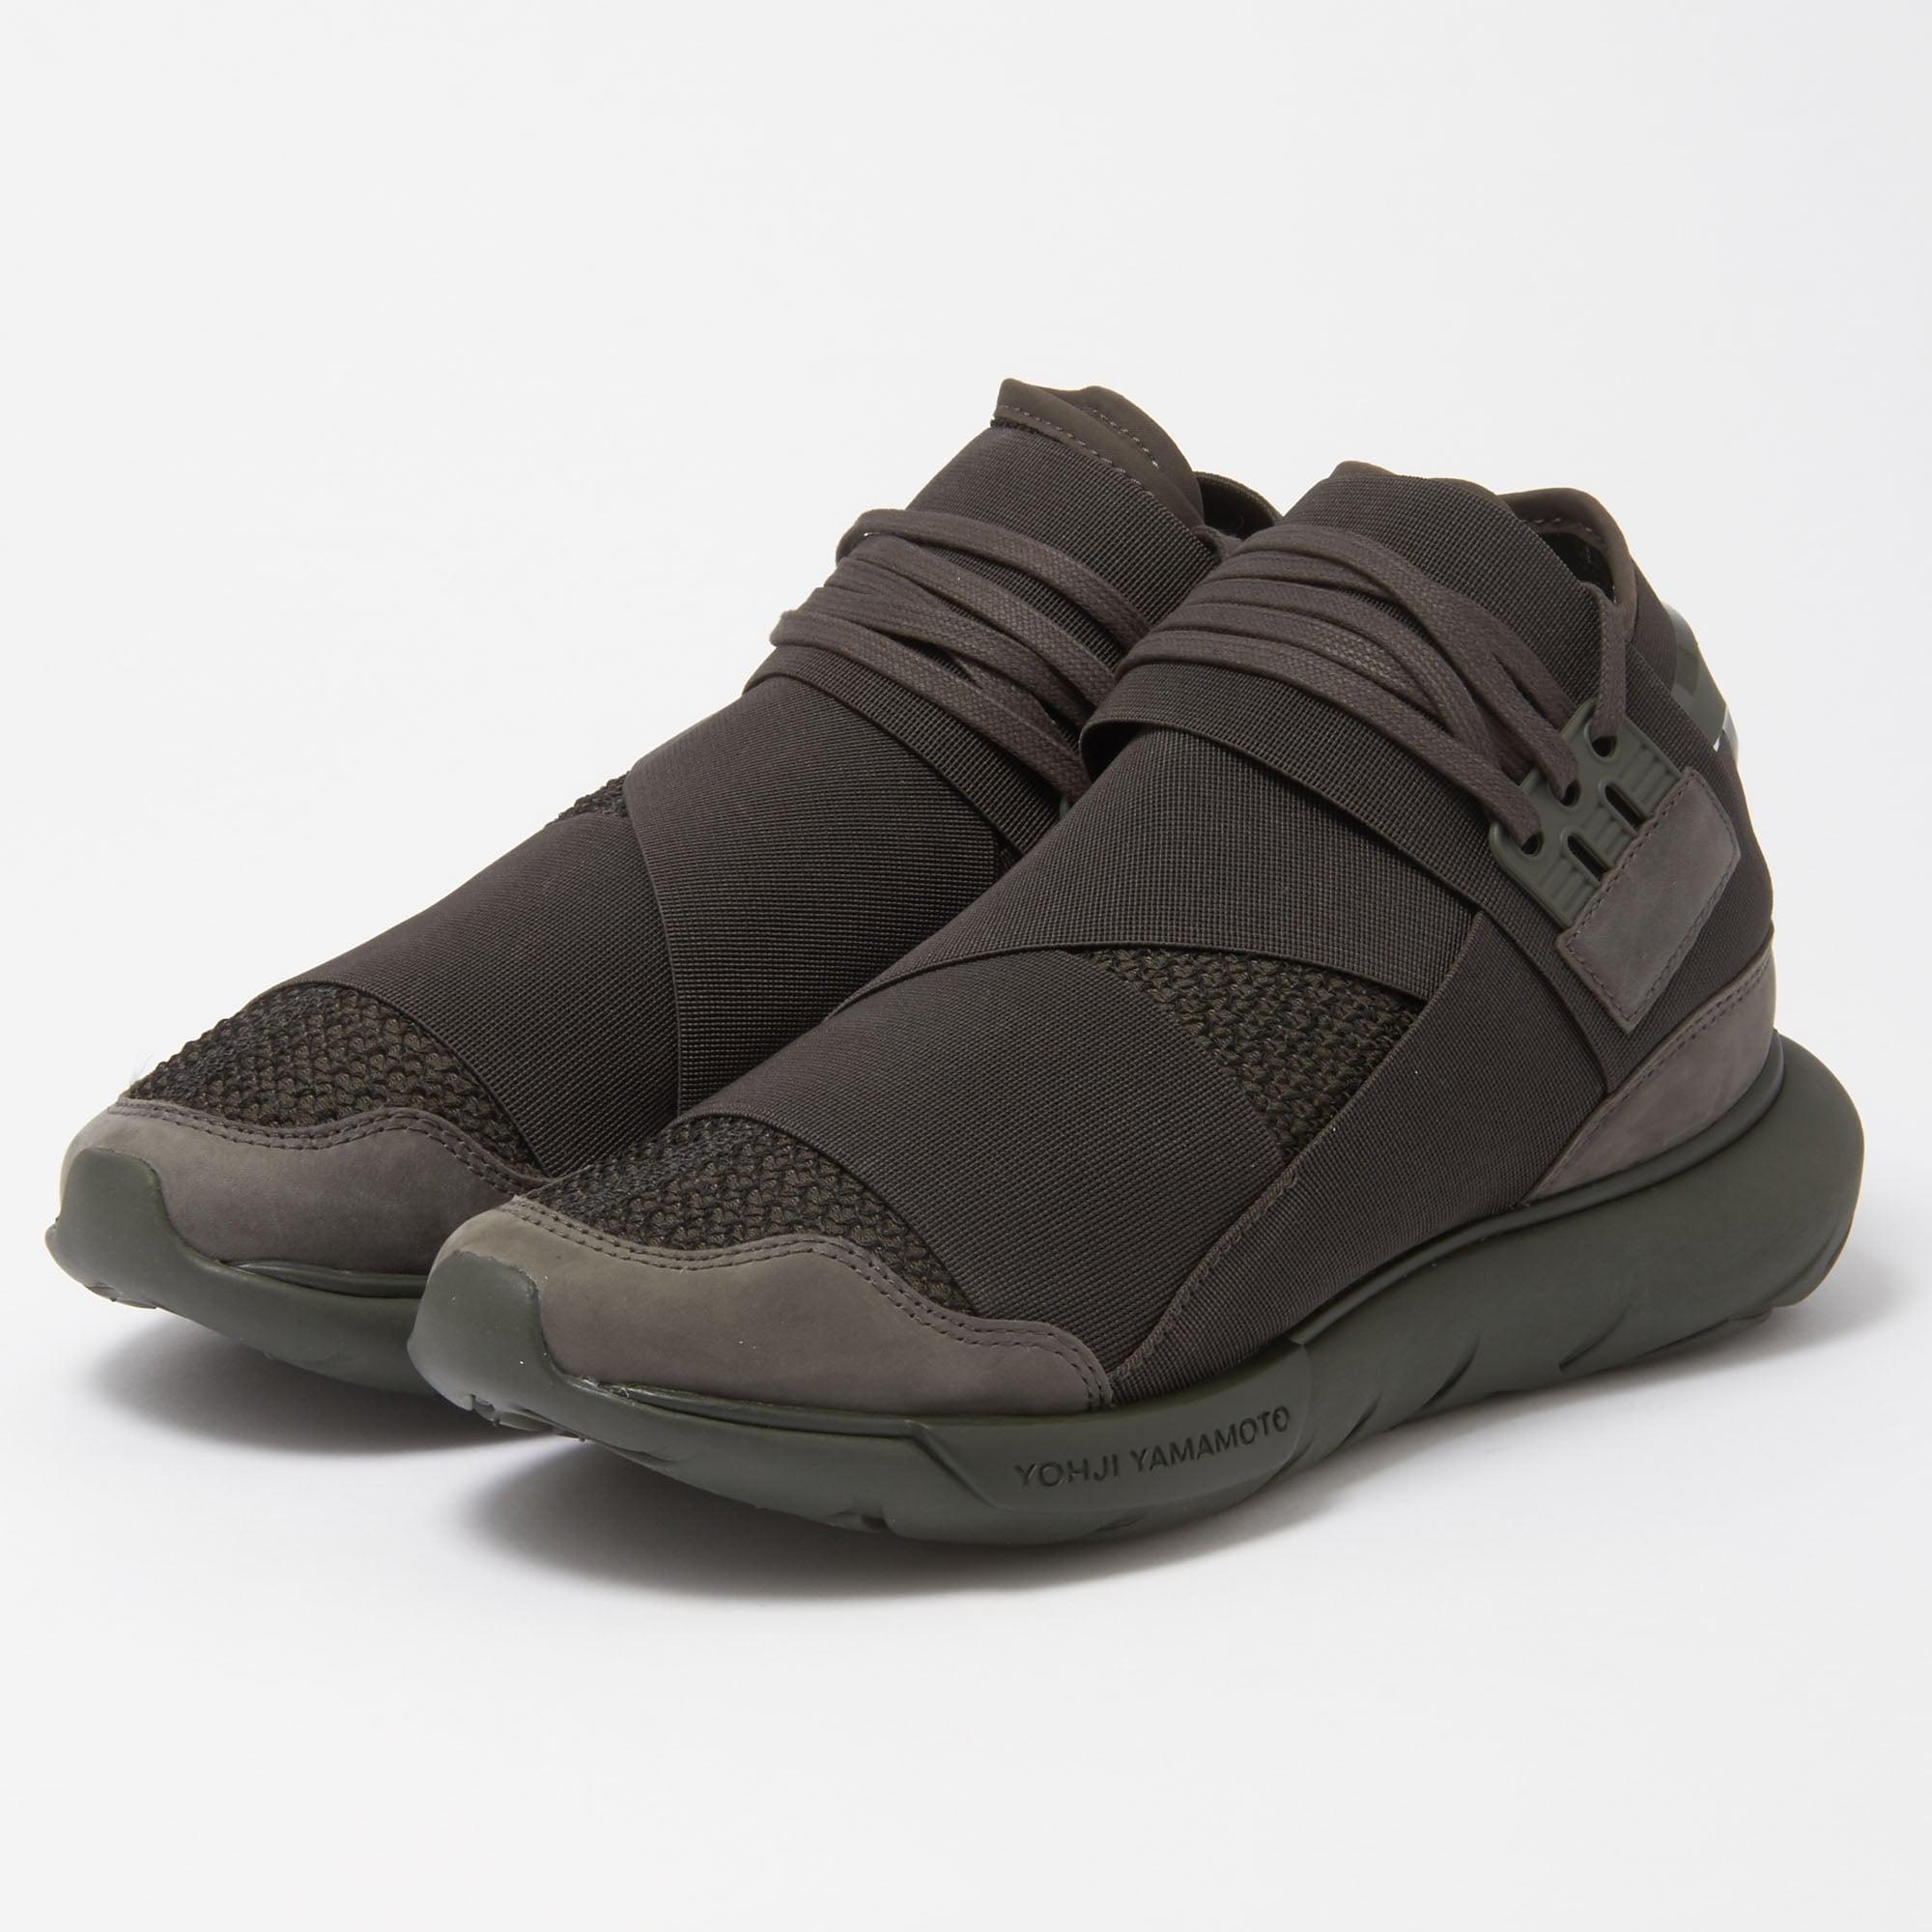 e2a5edf8c Y-3 Qasa High Black Olive Sneakers in Black for Men - Lyst